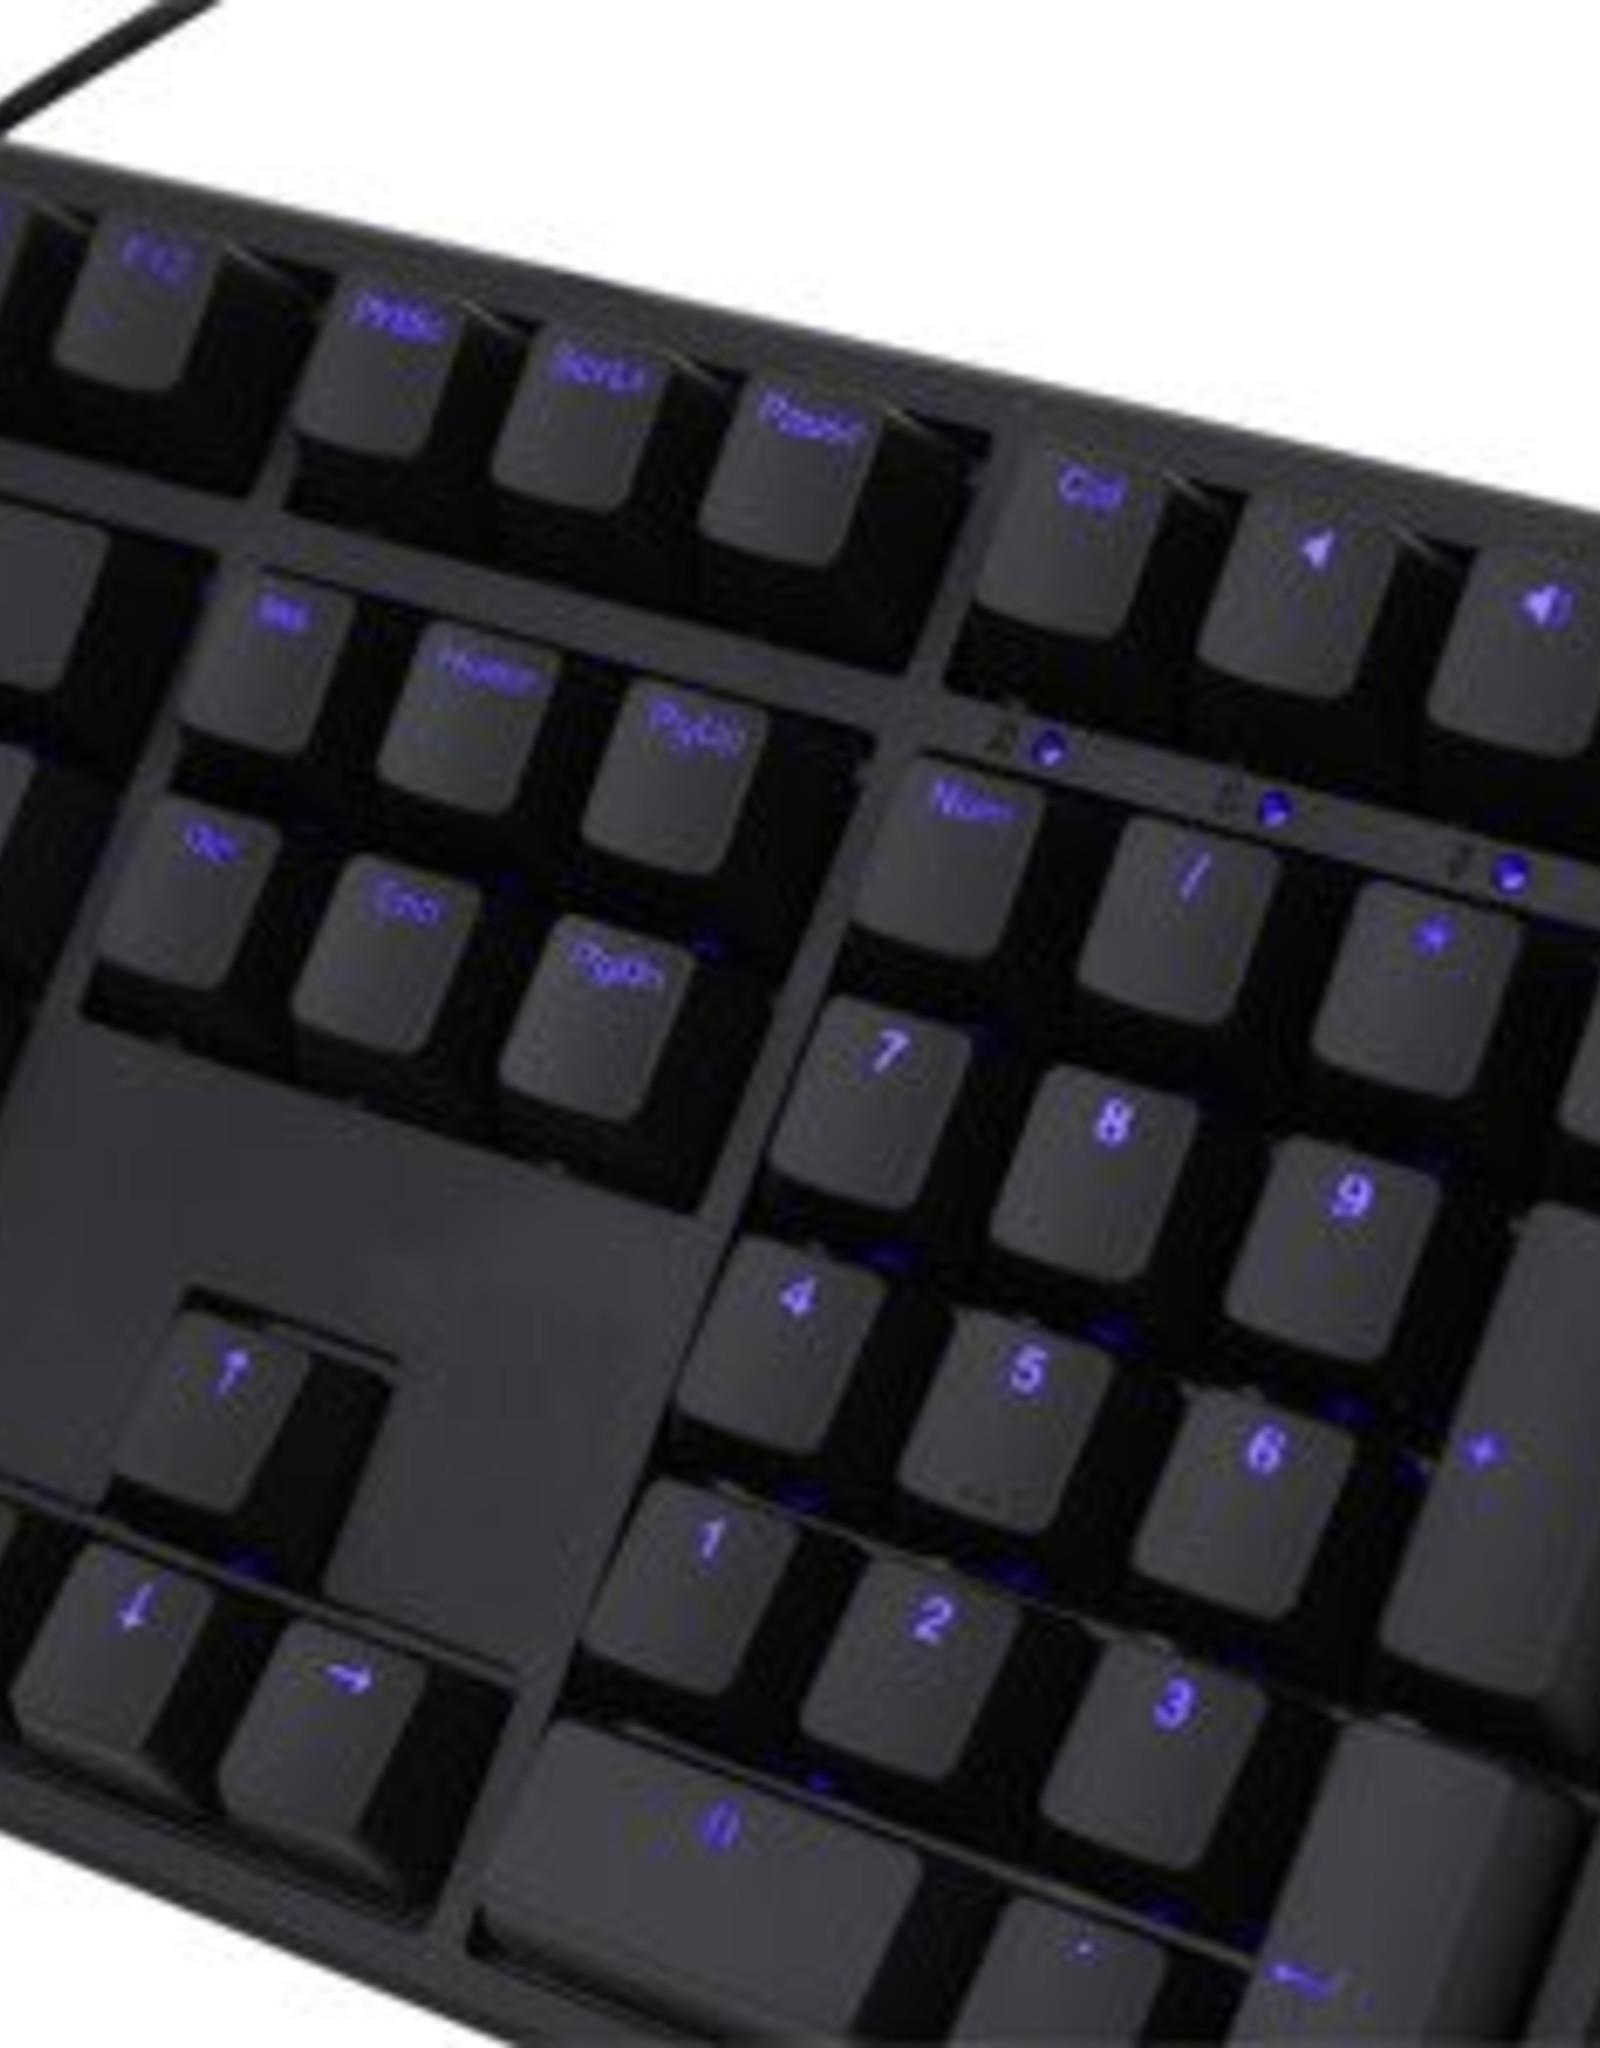 Ducky One BL LED Backlit Mechanical Keyboard